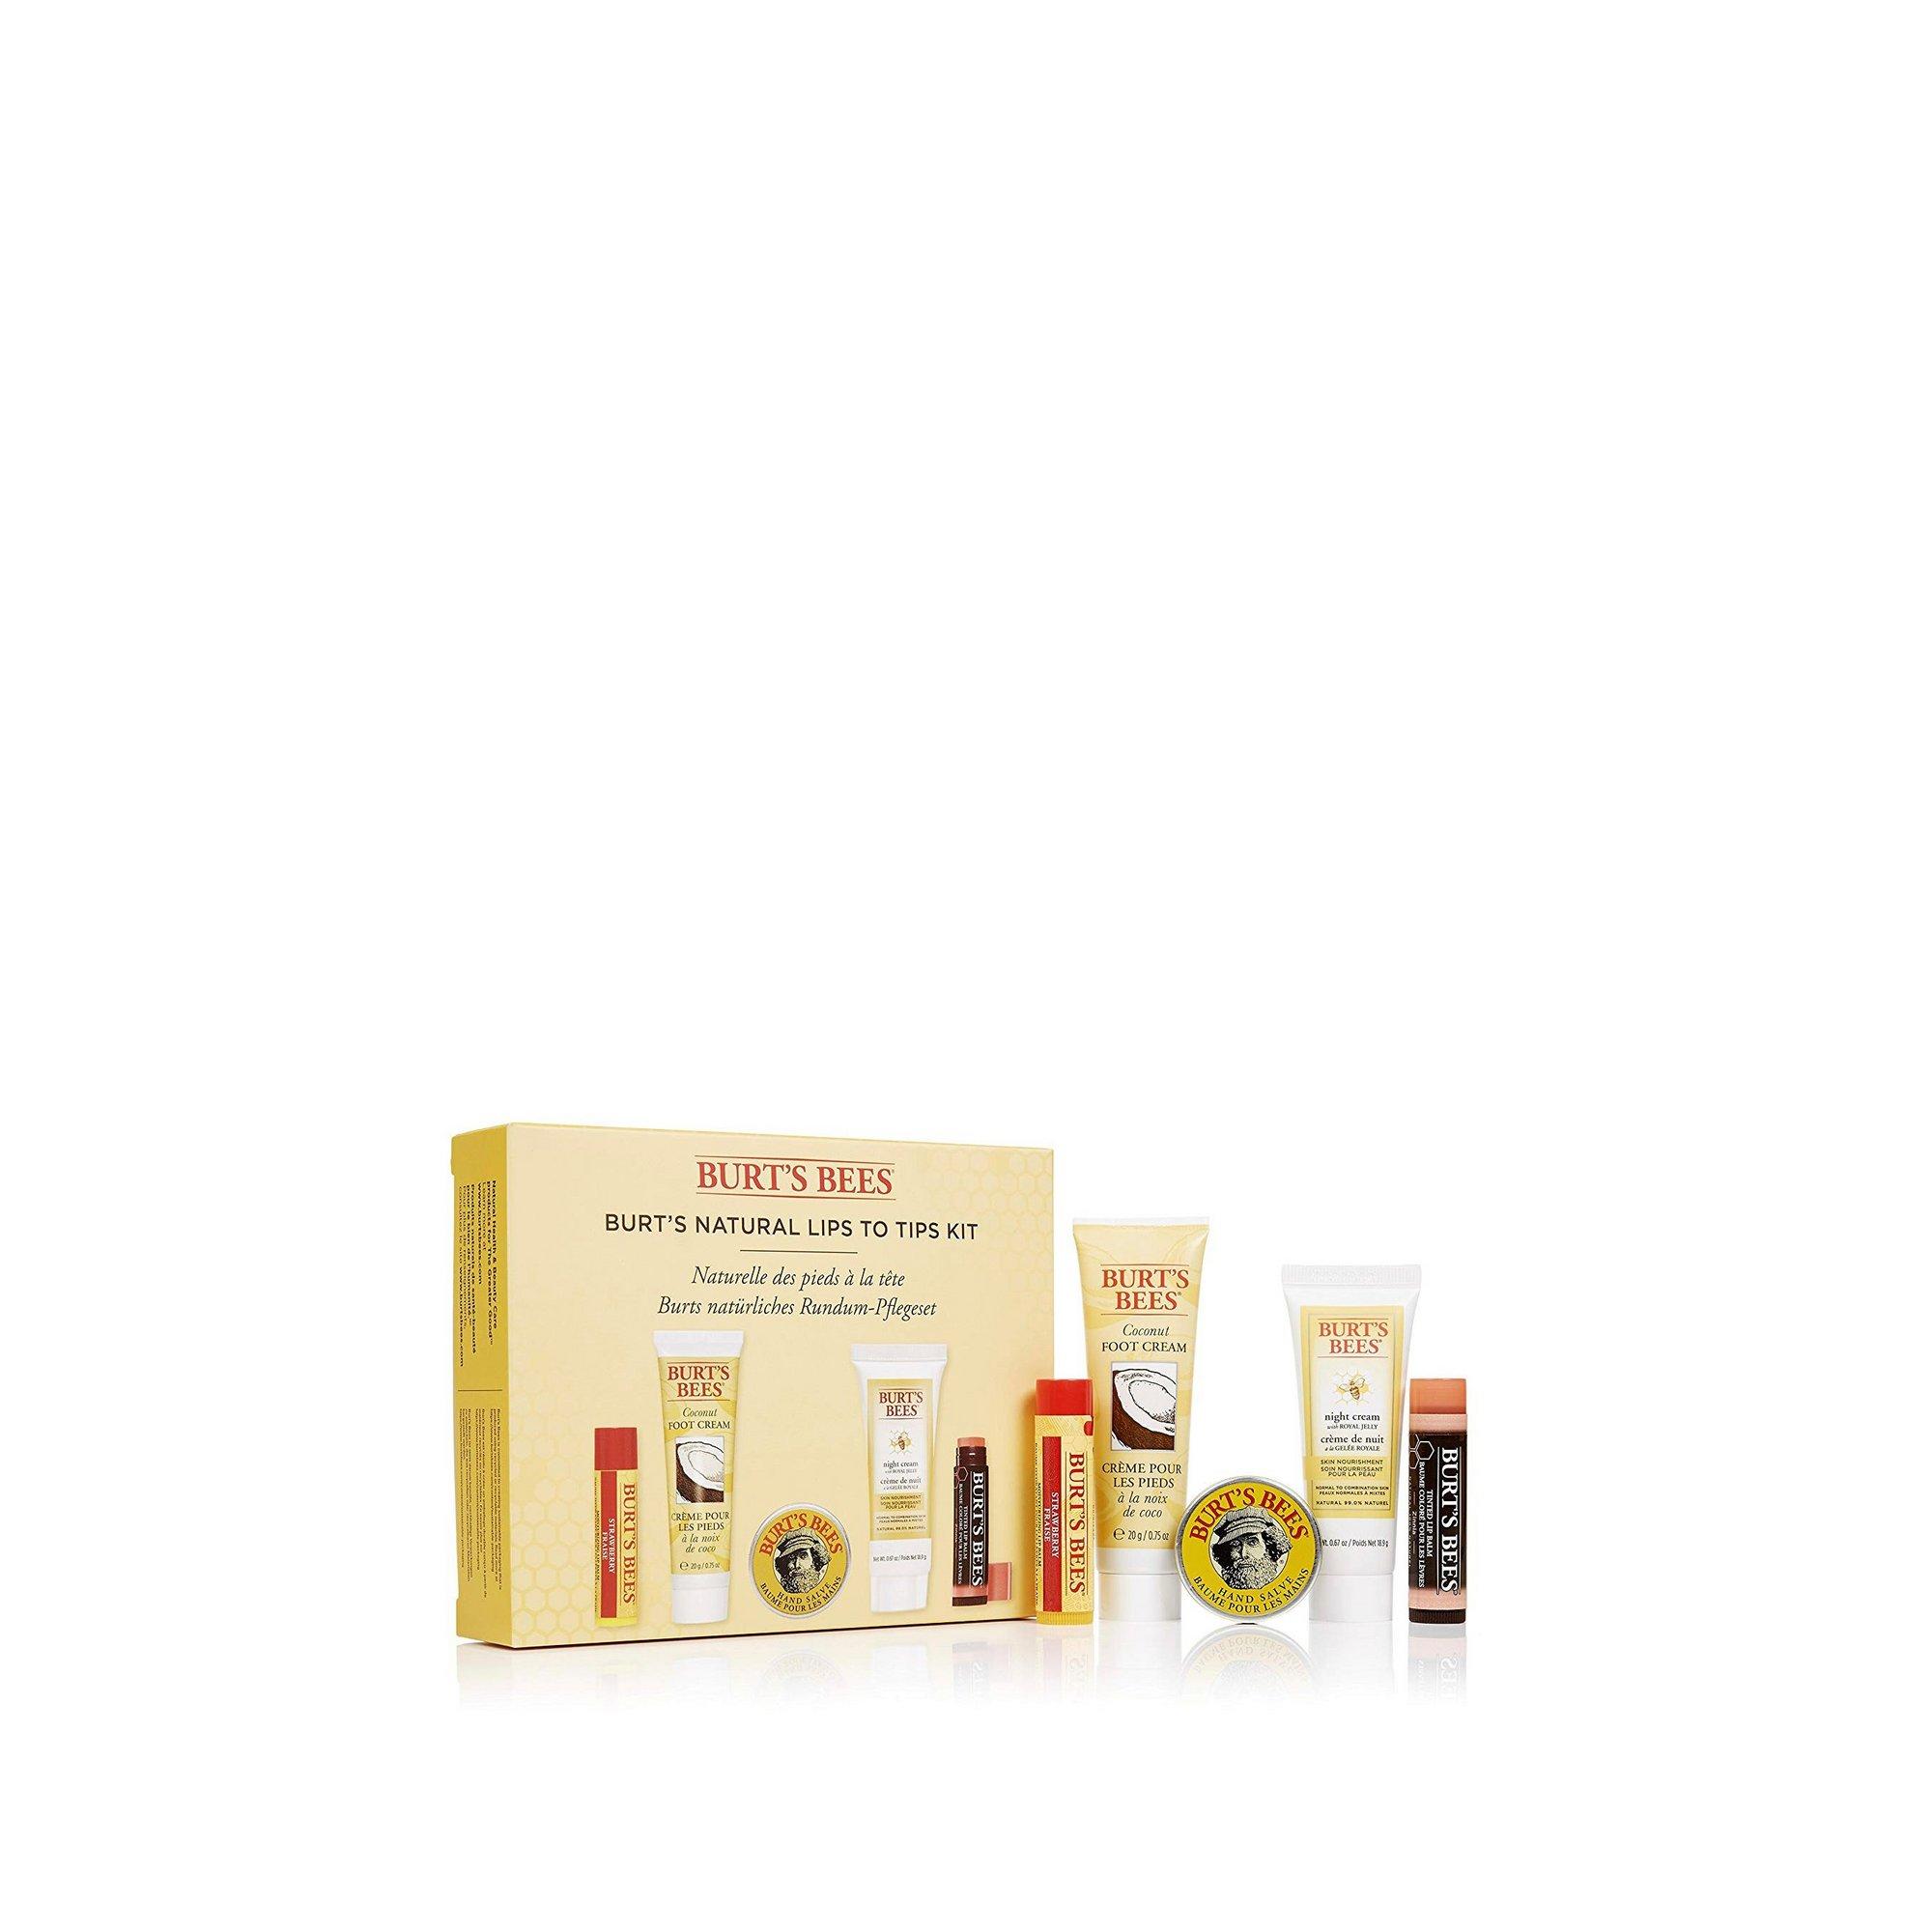 Image of Burts Bees Natural Lips to Tips Pamper Kit